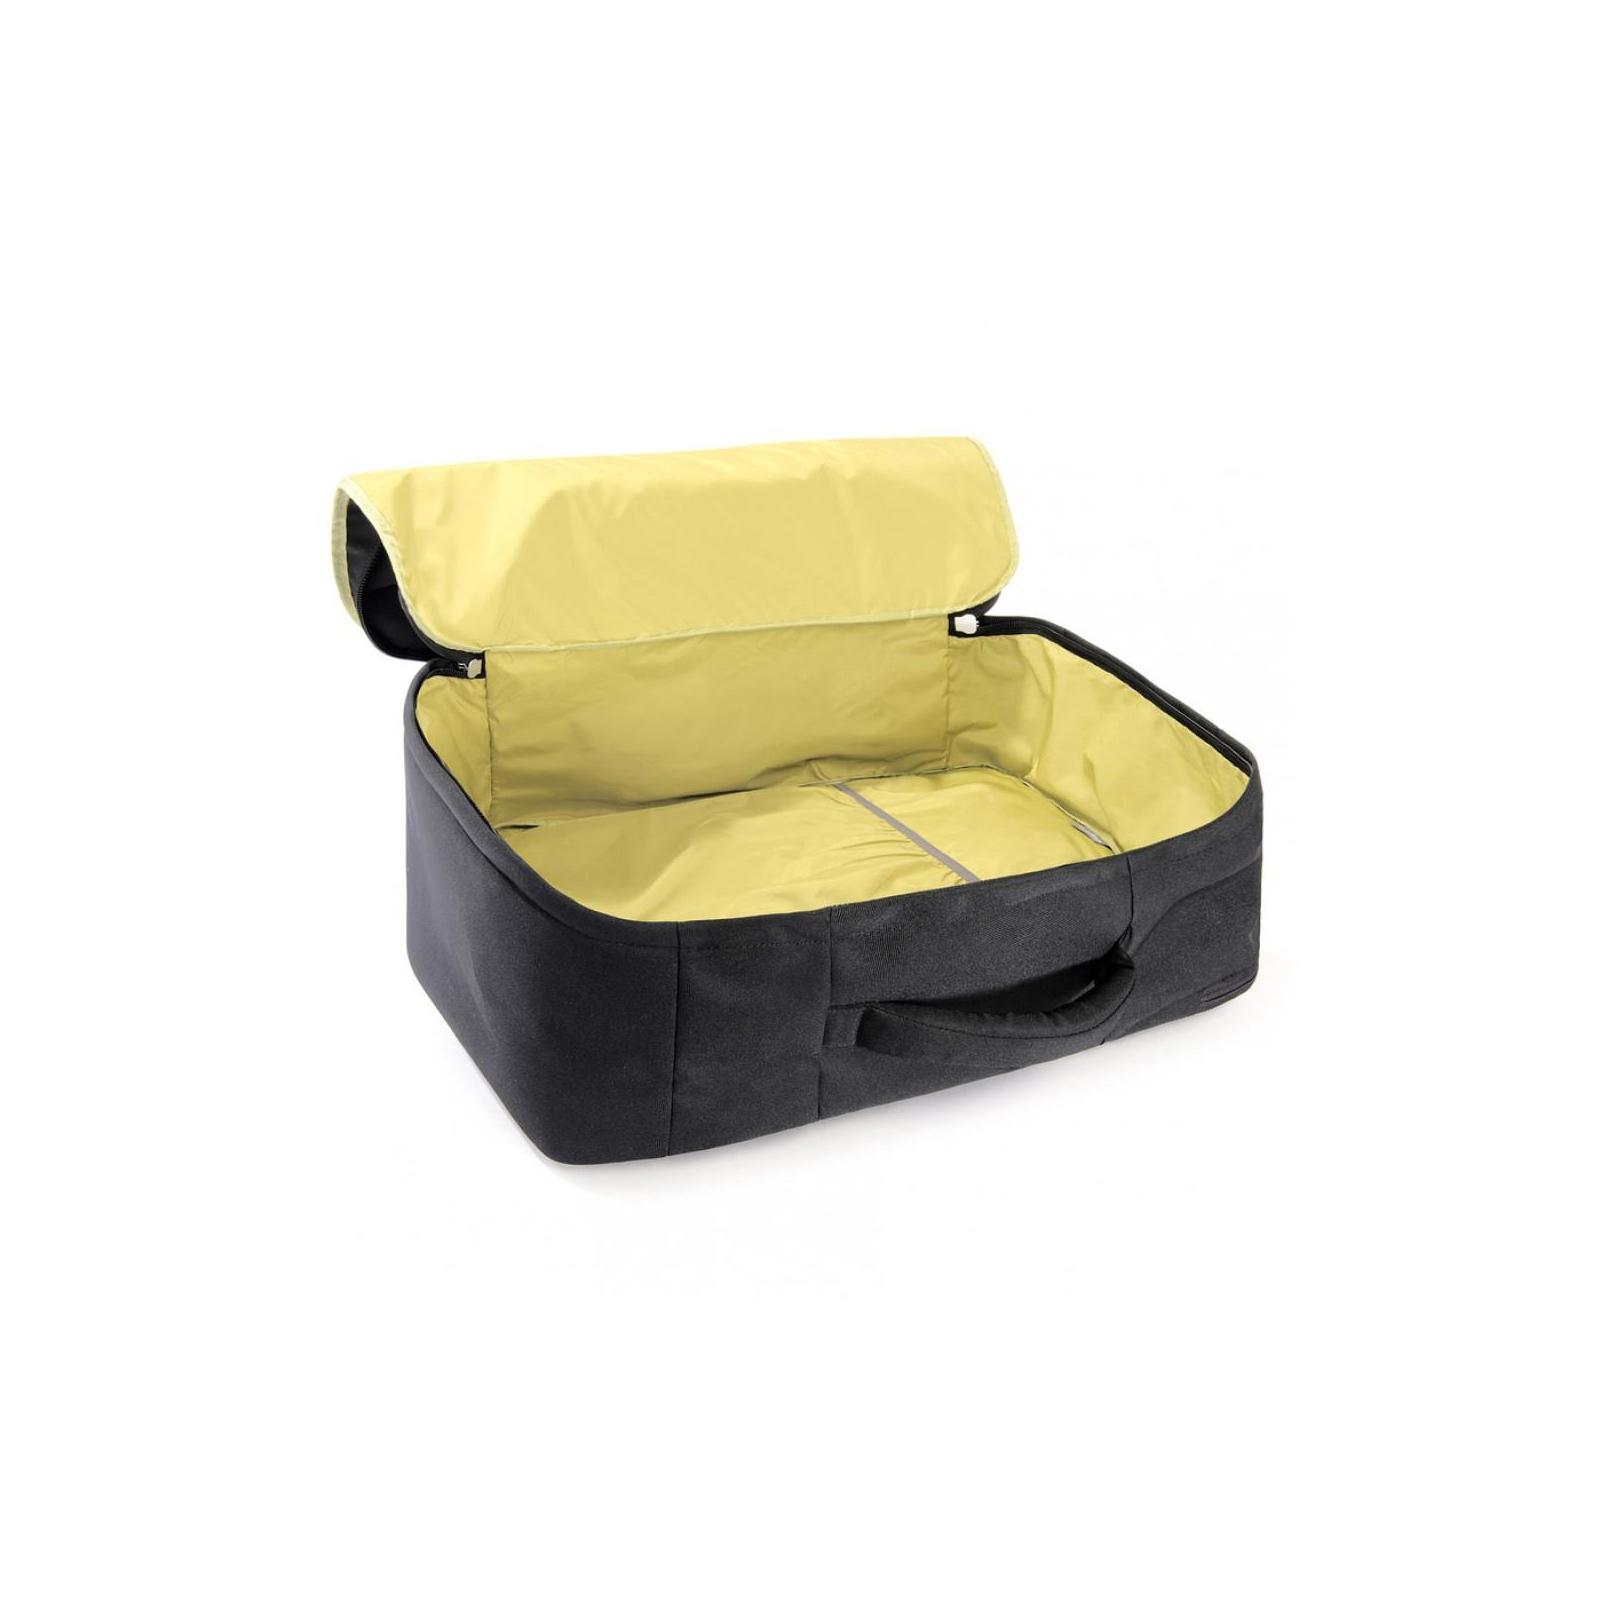 "Рюкзак для ноутбука Tucano 17.3"" TUGO' L CABIN black (BKTUG-L-BK) изображение 5"